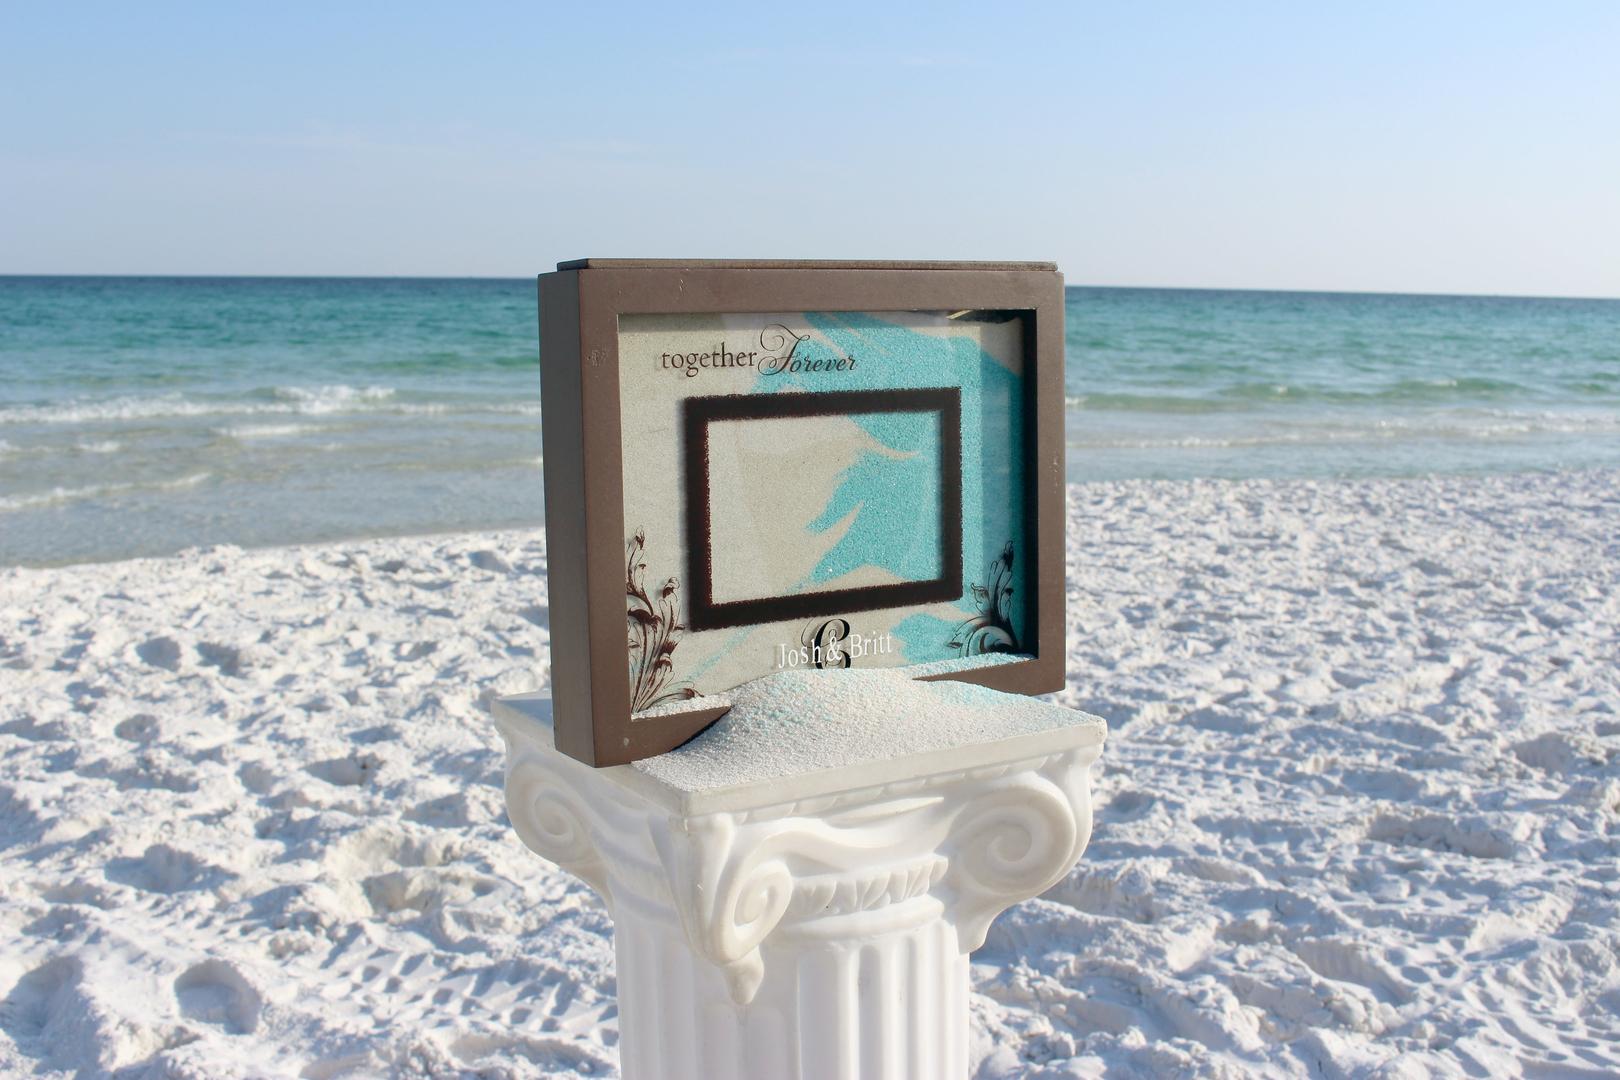 Beach weddings fort walton beach wedding packages sunset beach - Destin Beach Weddings Company Wedding Planners In Florida Yours Truly Weddings